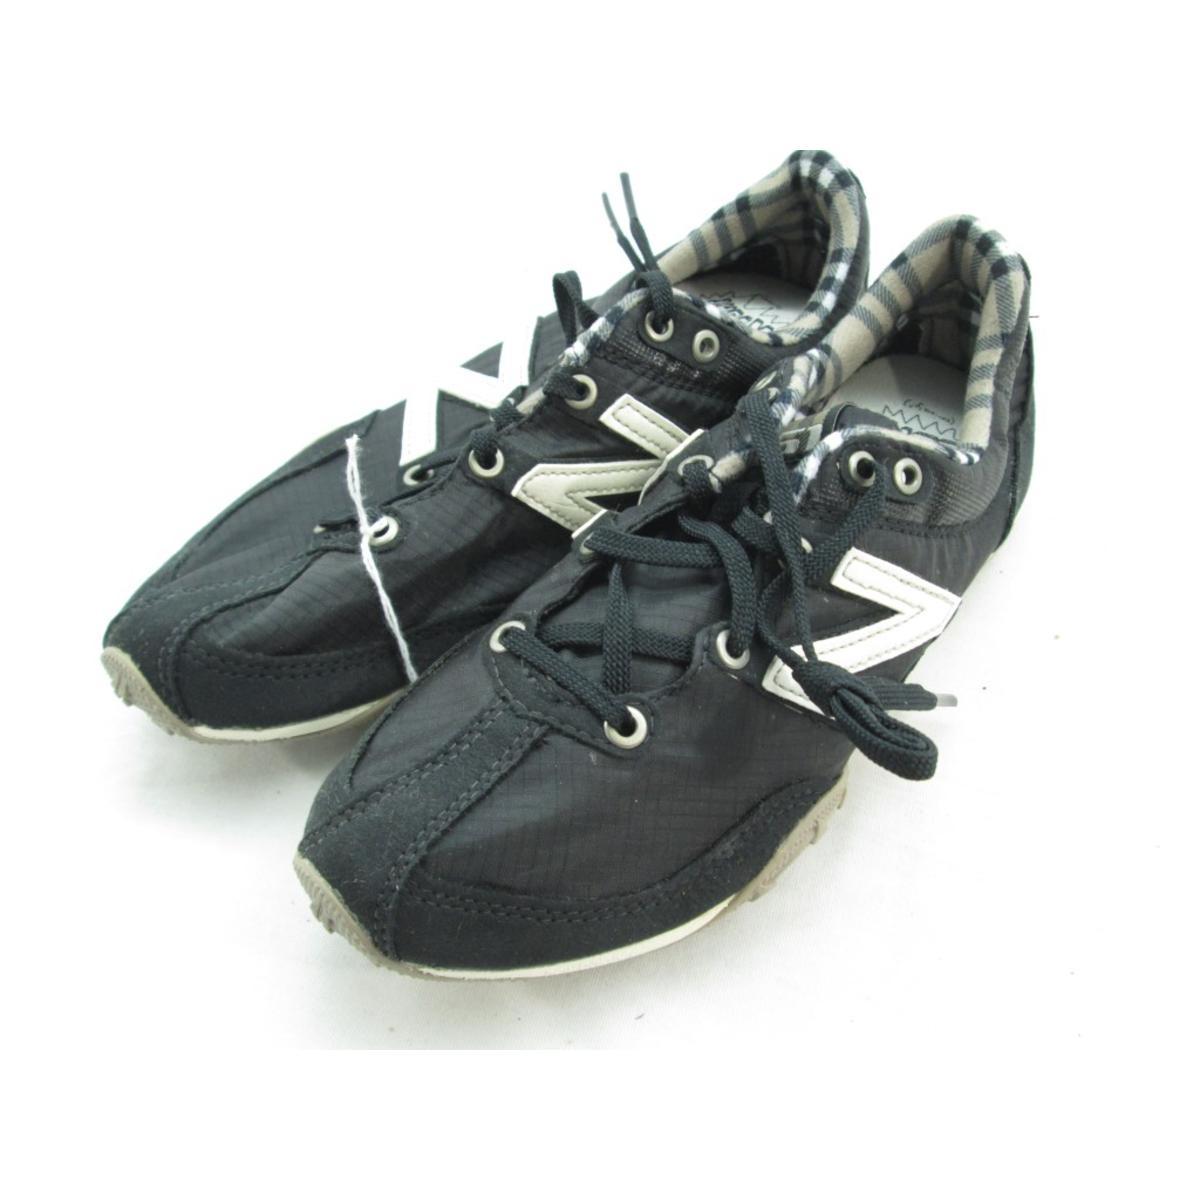 New balance WT561BK WT561BK WT561BK Donna Nero Gris In esecuzione sneaker 6M d625c7